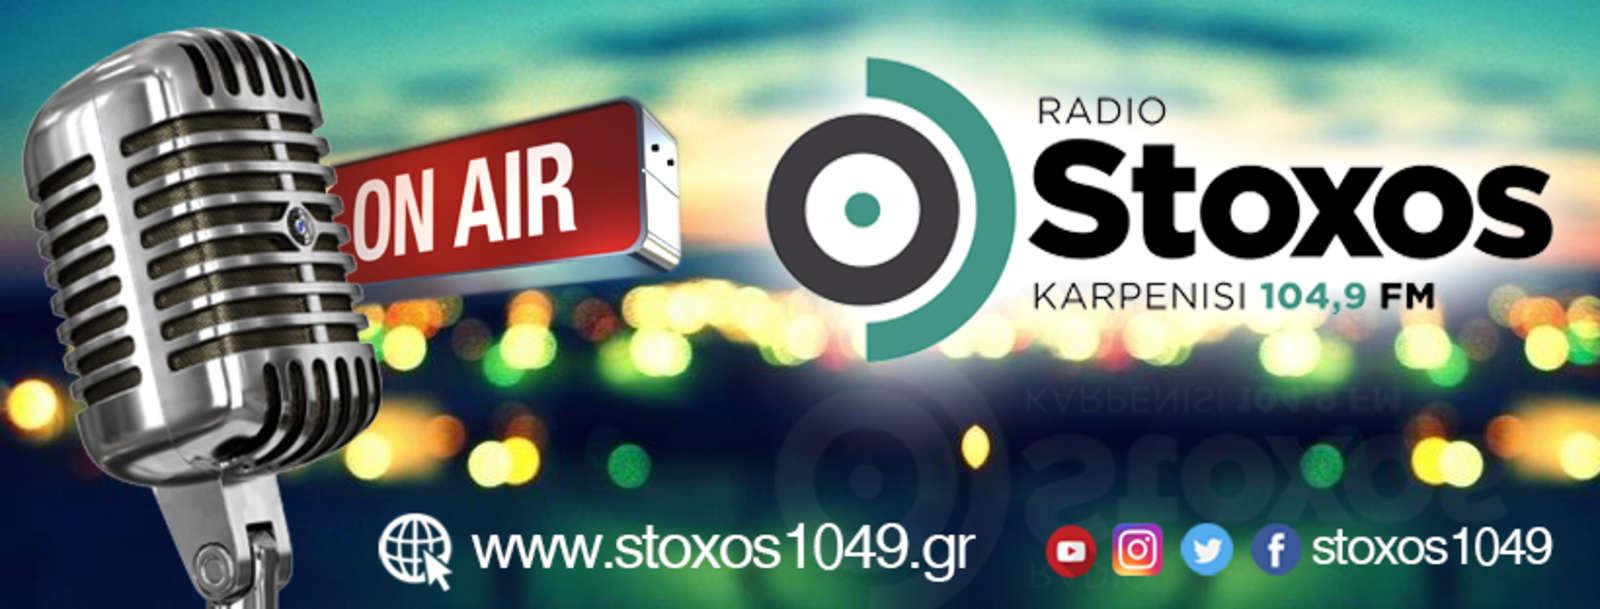 RADIO Stoxos KARPENHSI 104,9 FM